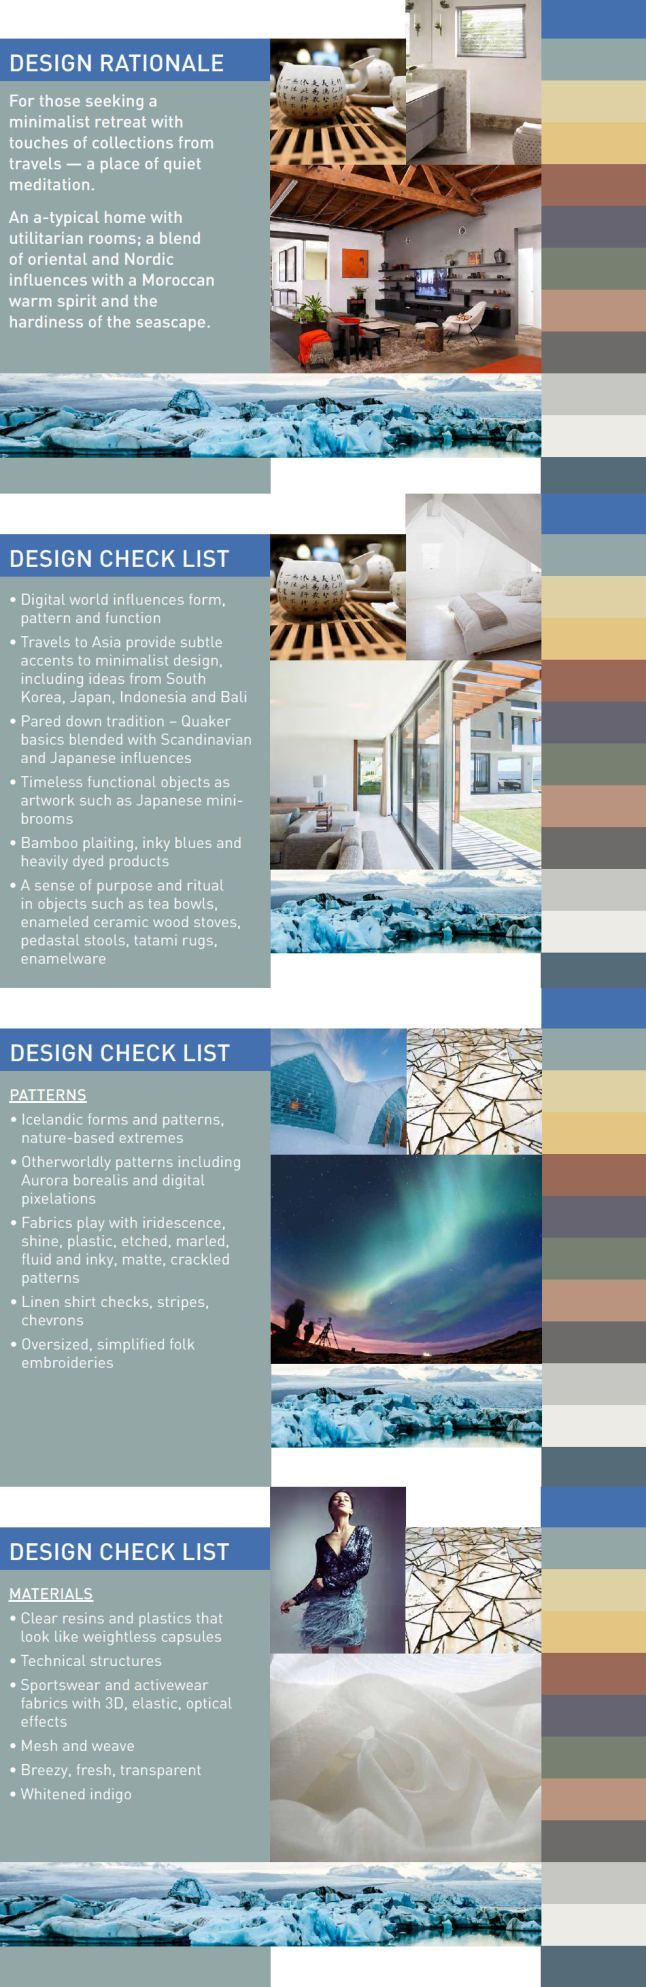 45 Best Home Design Trends For 2016 Images On Pinterest